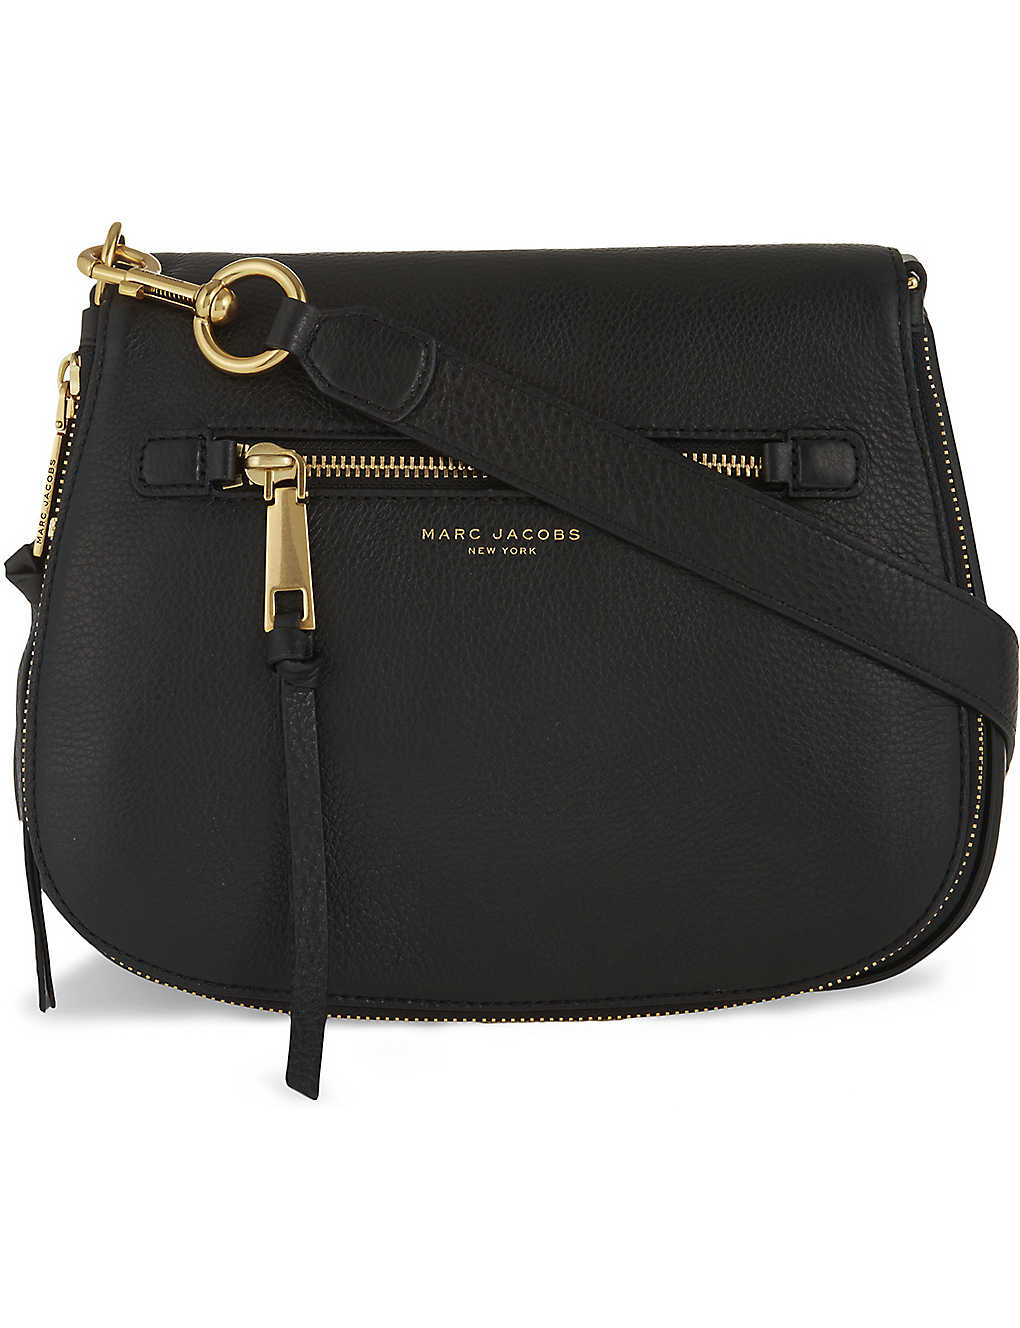 9dabd625982 MARC JACOBS - Recruit leather saddle bag | Selfridges.com